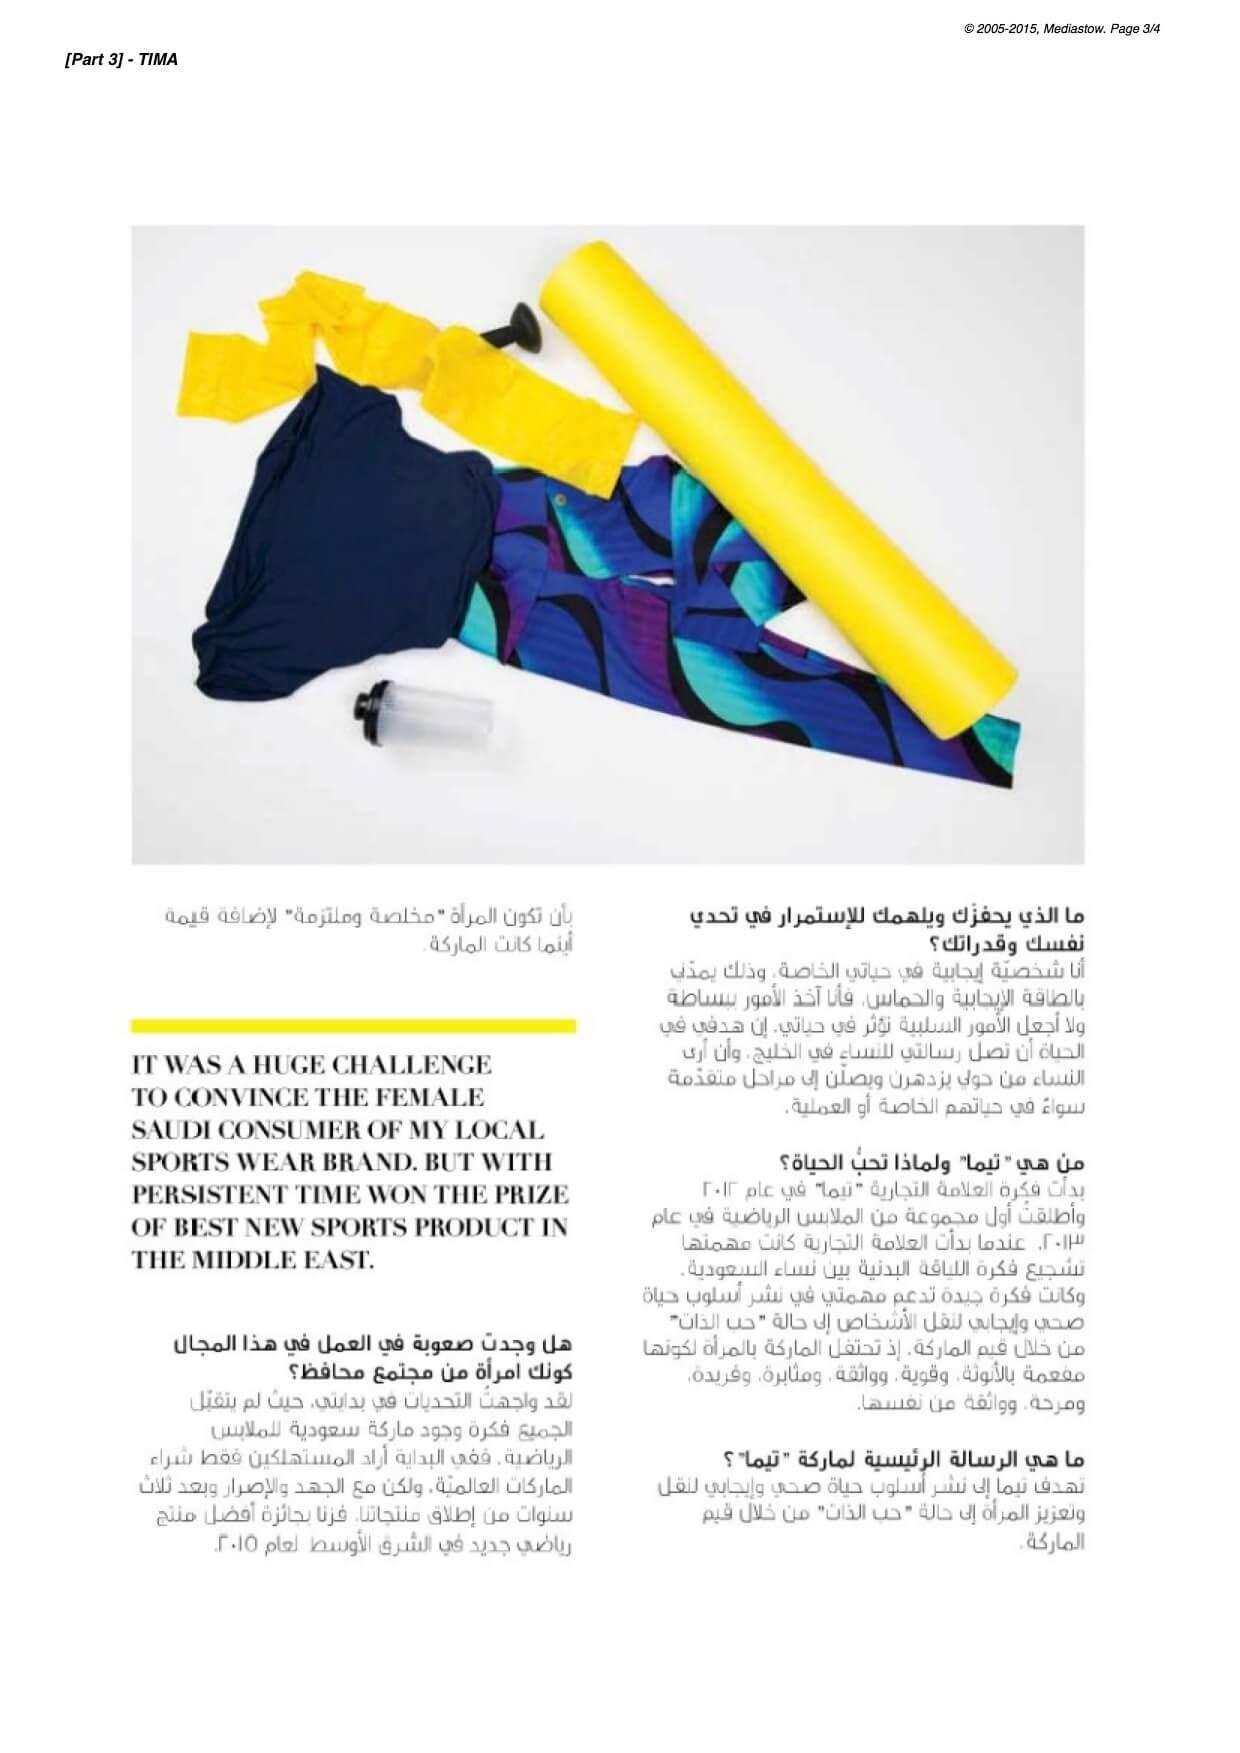 Tima - Al Ostoura Kuwait - Nottyvember 2016 - Page 7 - 10